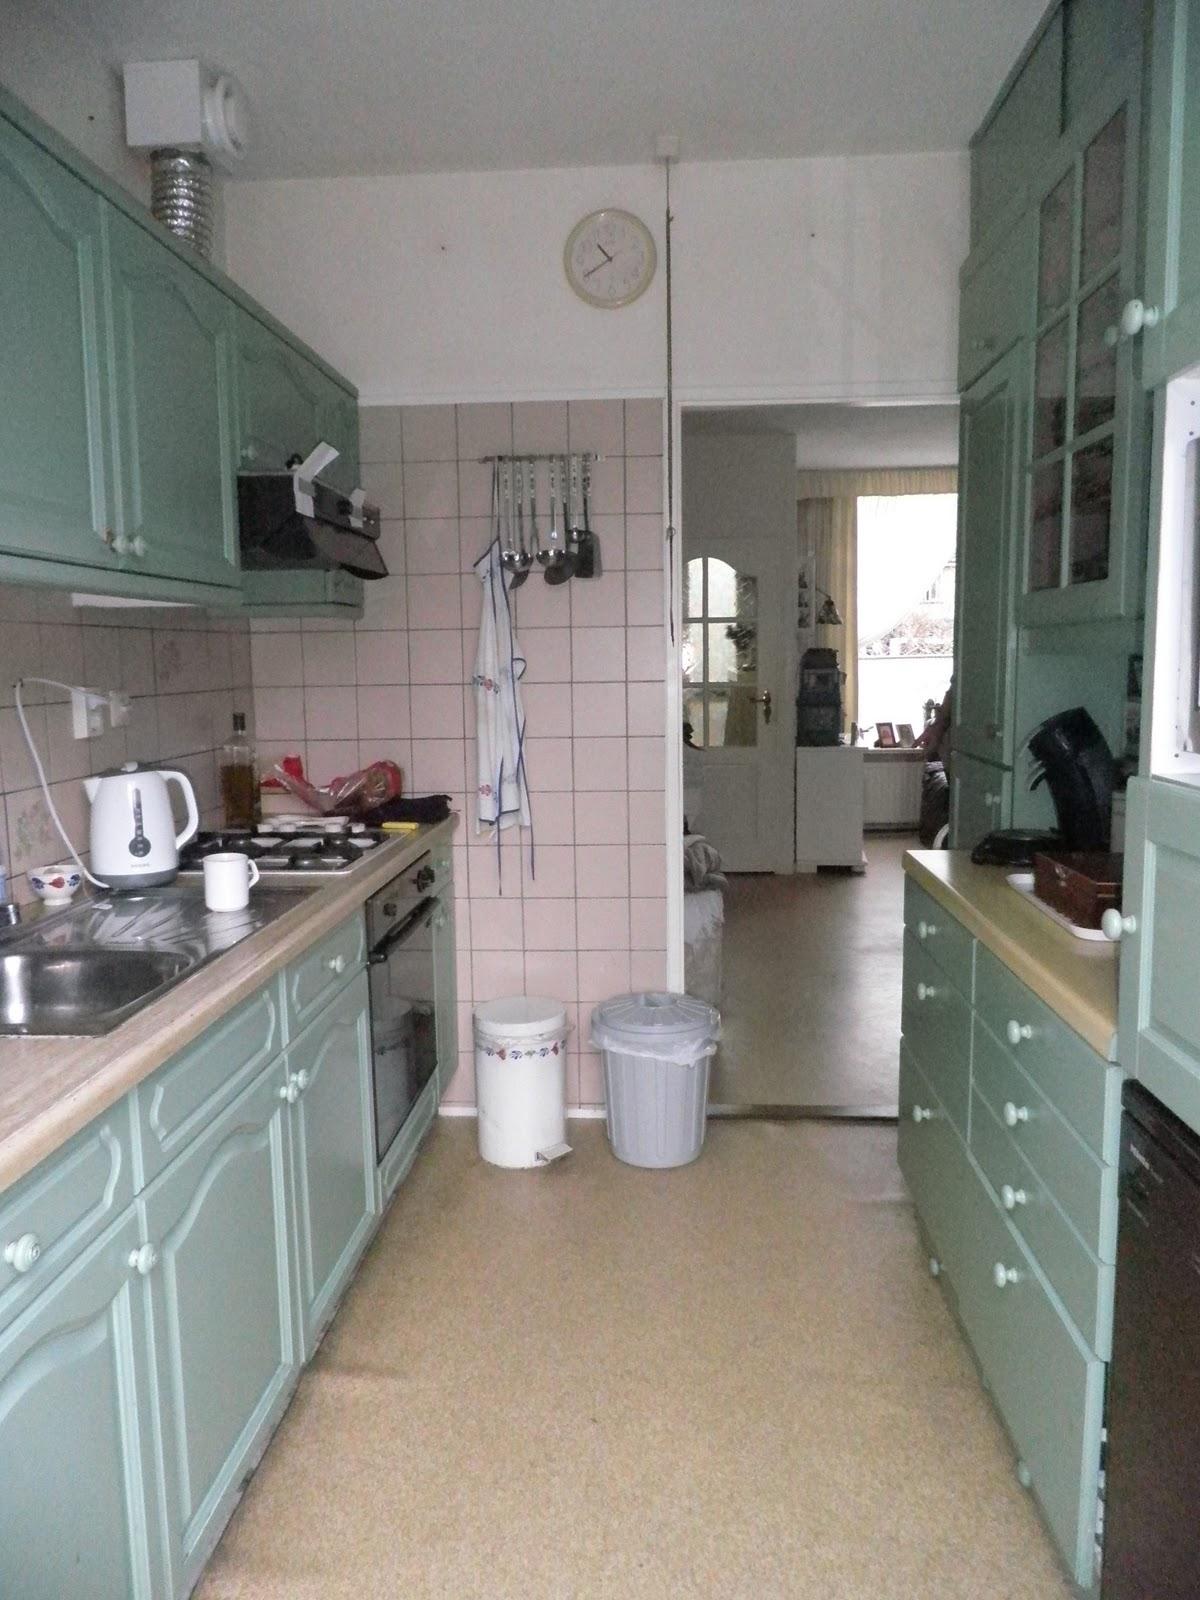 Extreem Oude Keuken Opknappen BE27 | Belbin.Info QS28